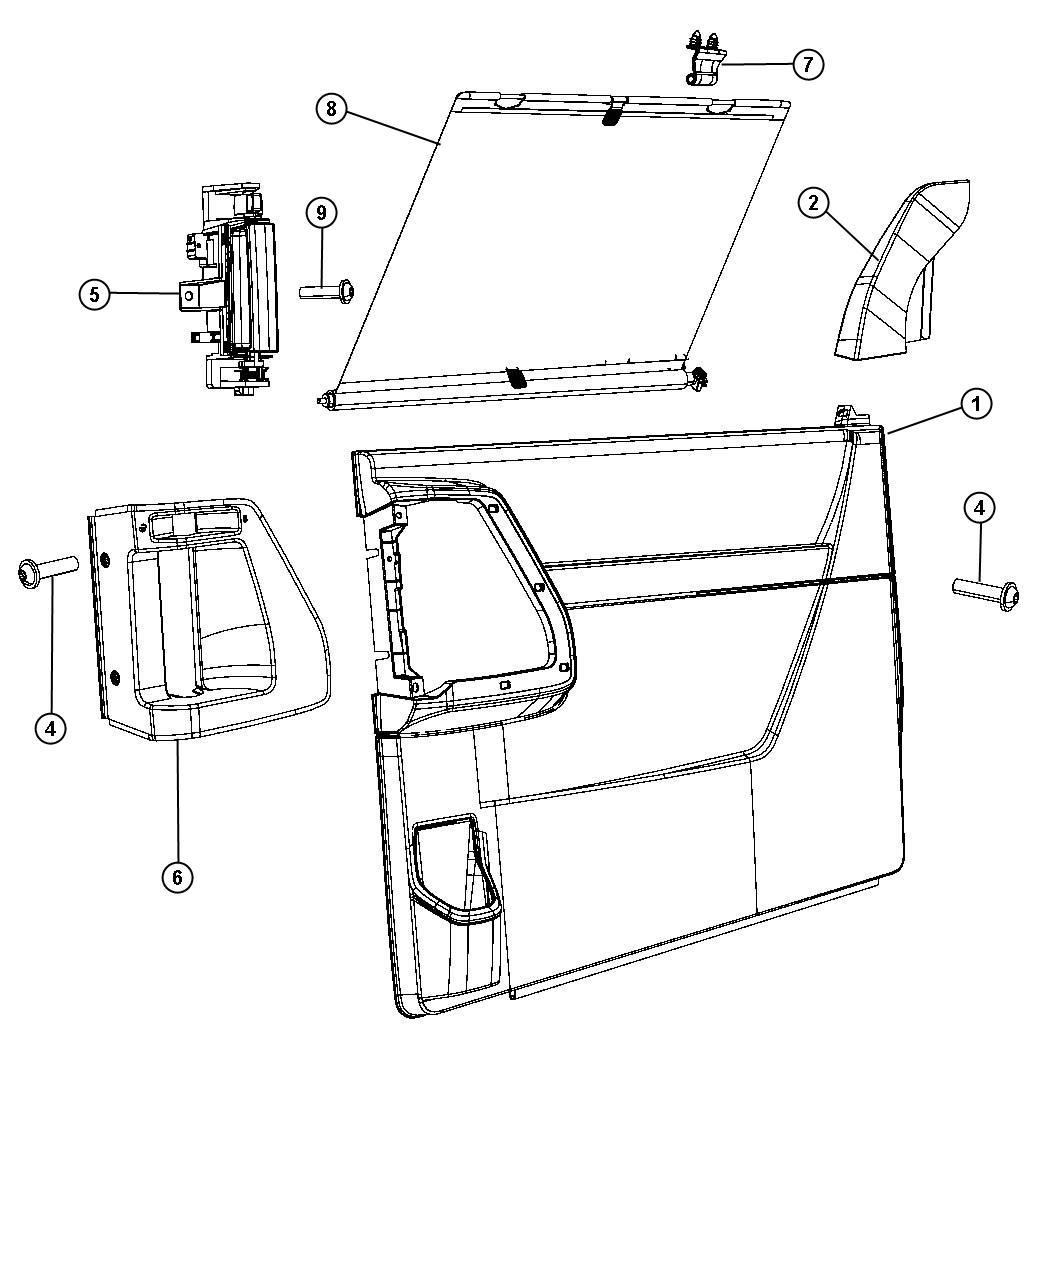 2007 dodge caravan sxt transmission wiring diagram